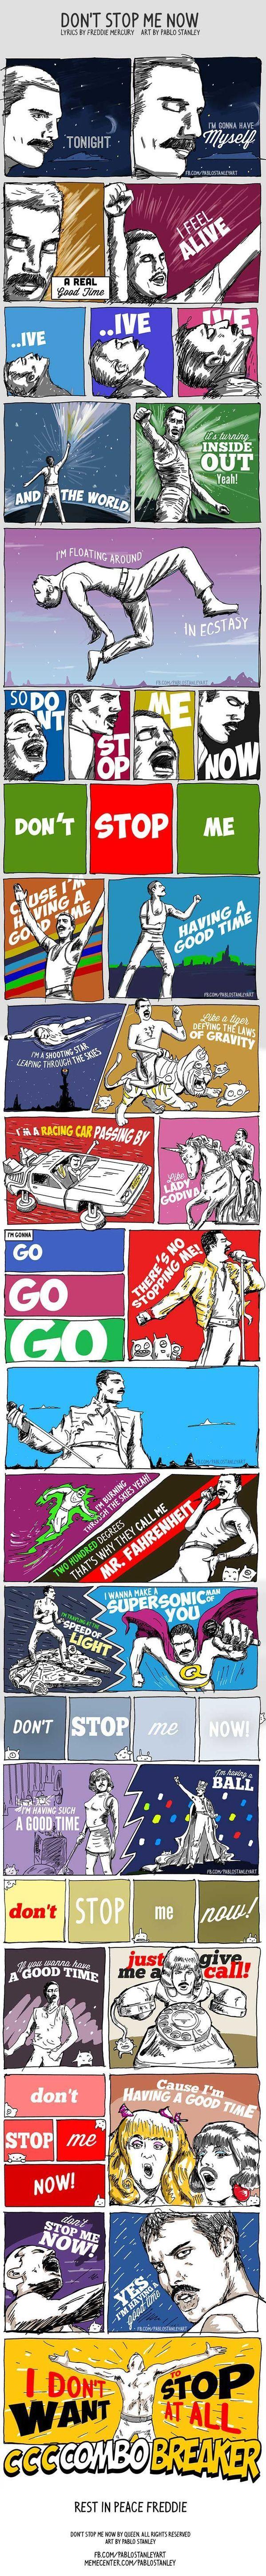 dont stop me now - Freddie Mercury